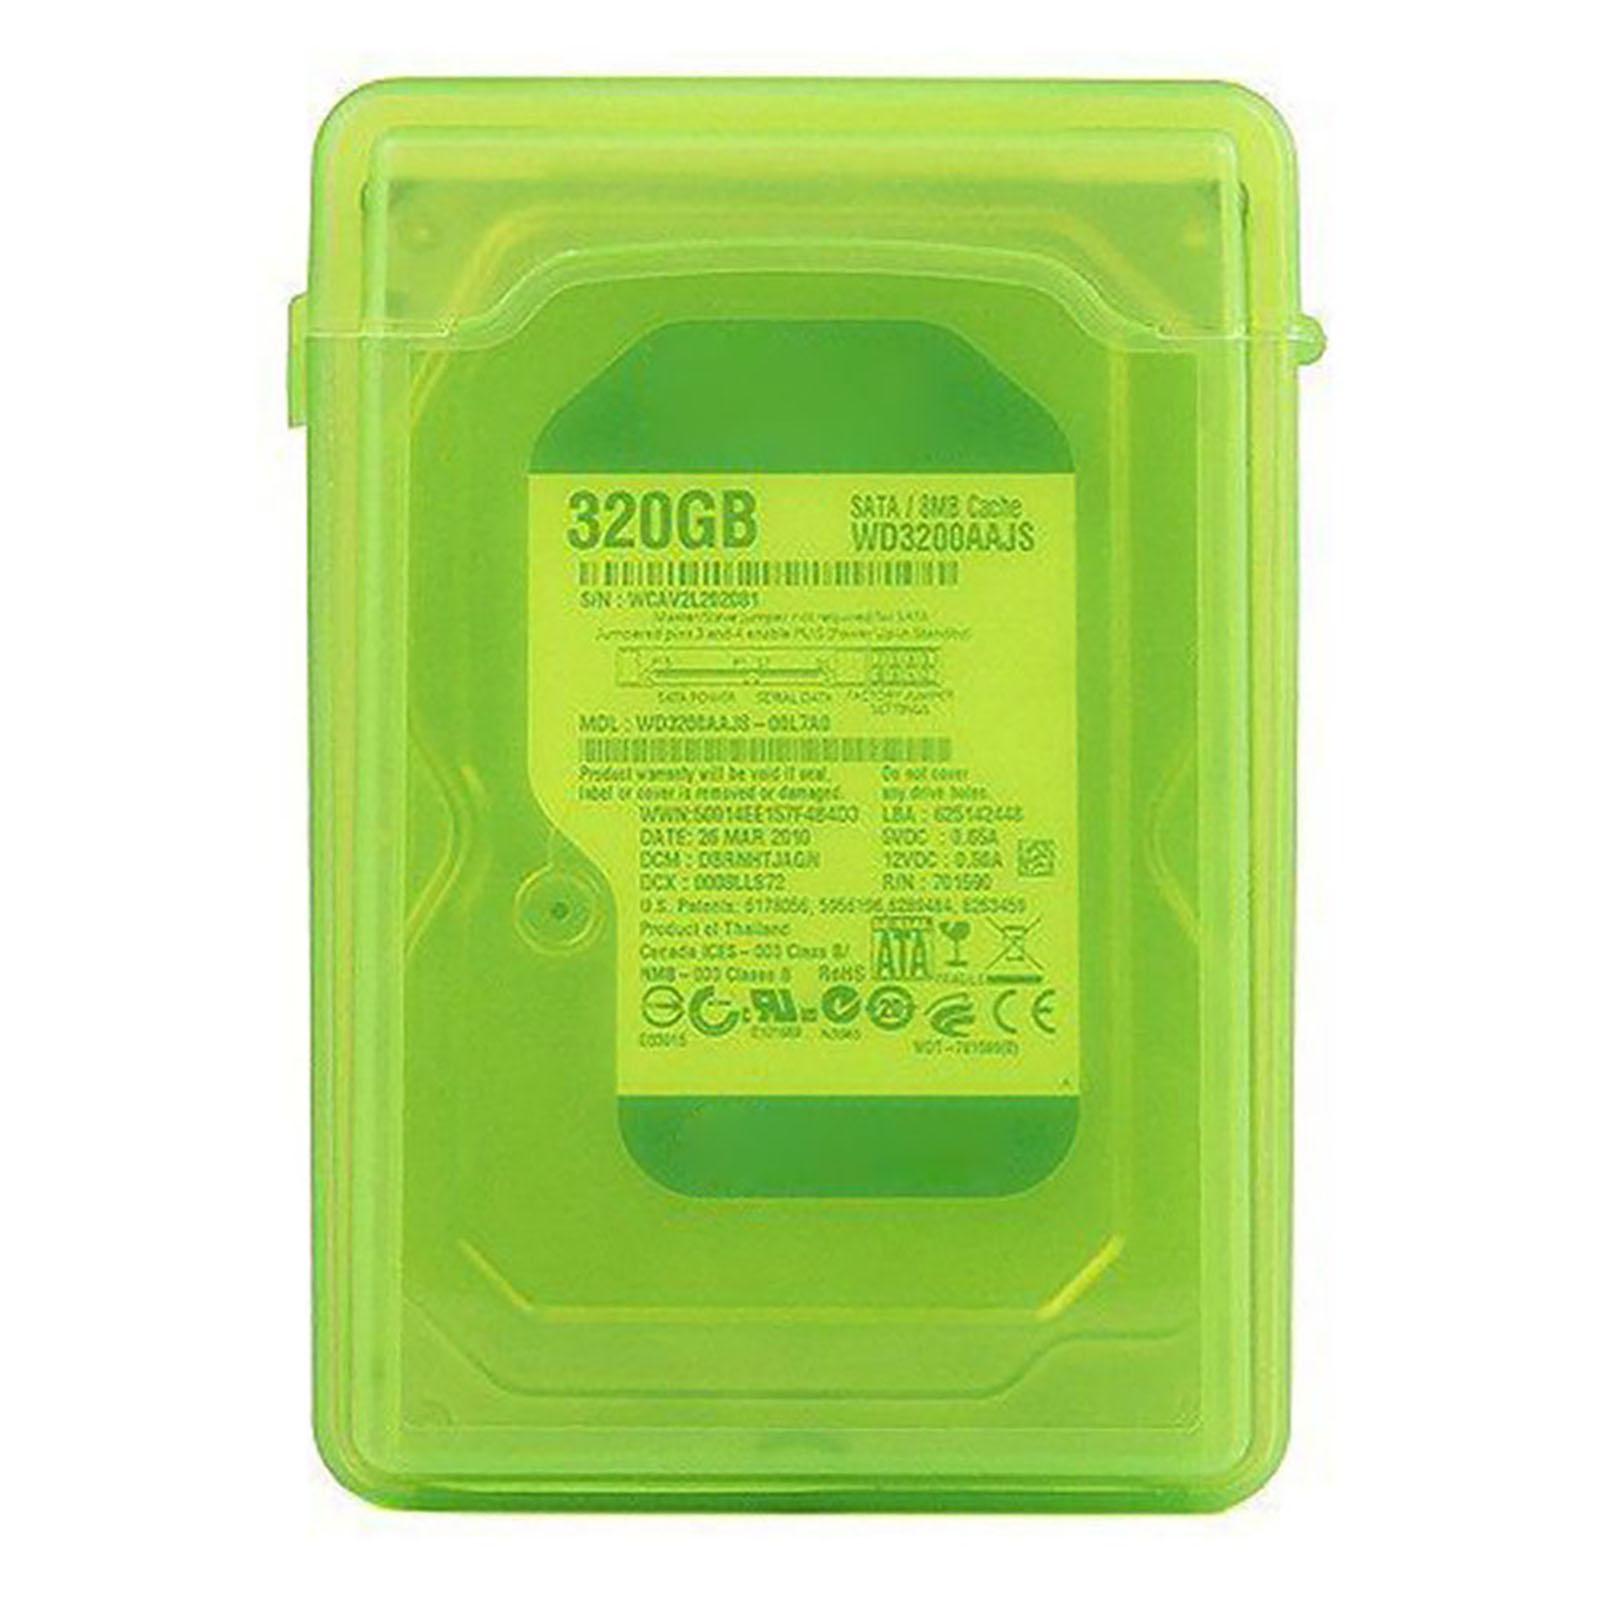 Protection-Plastic-Storage-Box-Case-Enclosure-for-3-5-039-039-SATA-HDD-Hard-Drive-Disk thumbnail 10